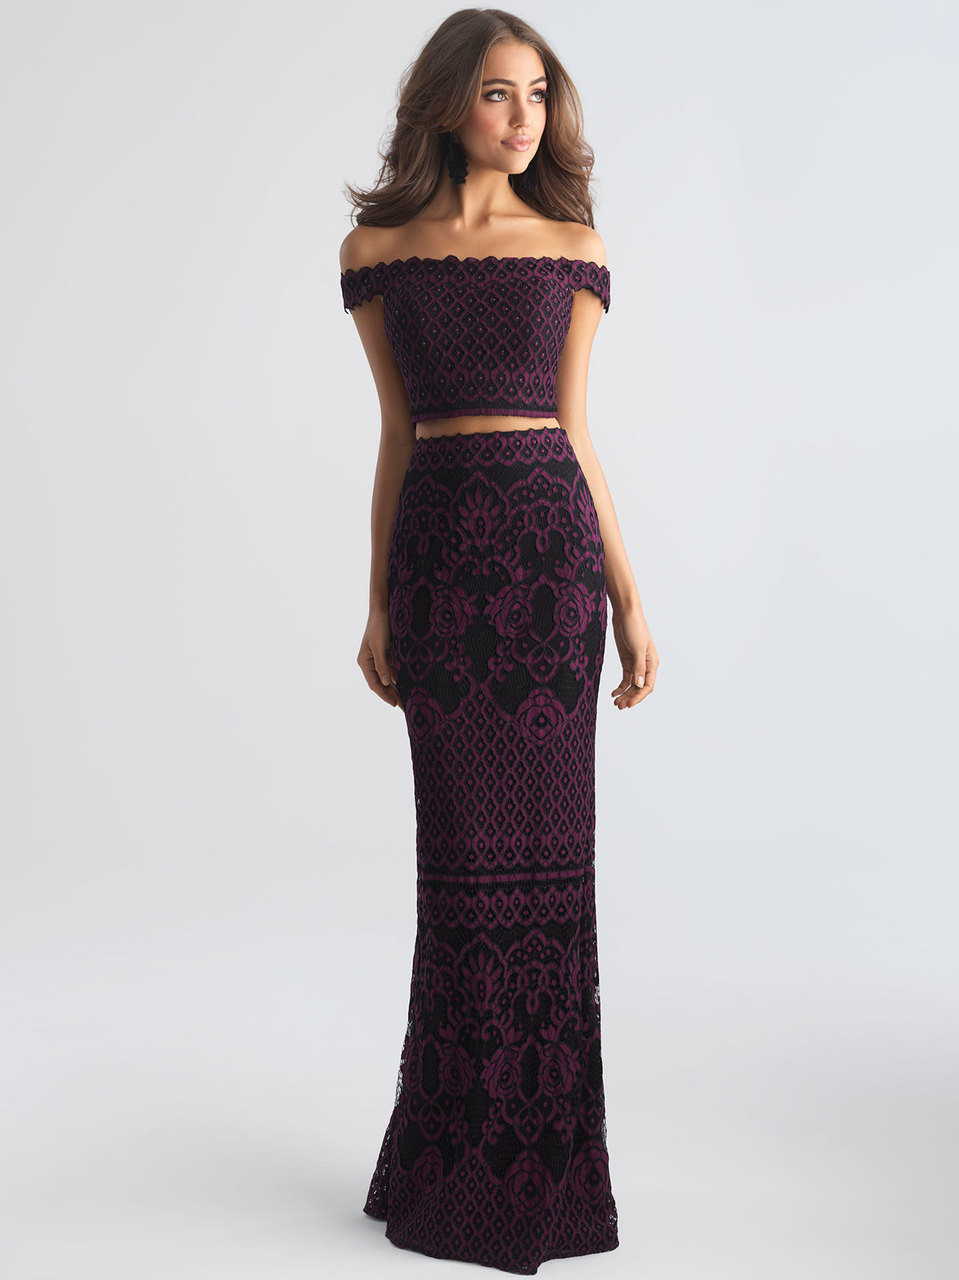 81e68cf0e34 plum two piece prom dress off the shoulder madison james 18-646